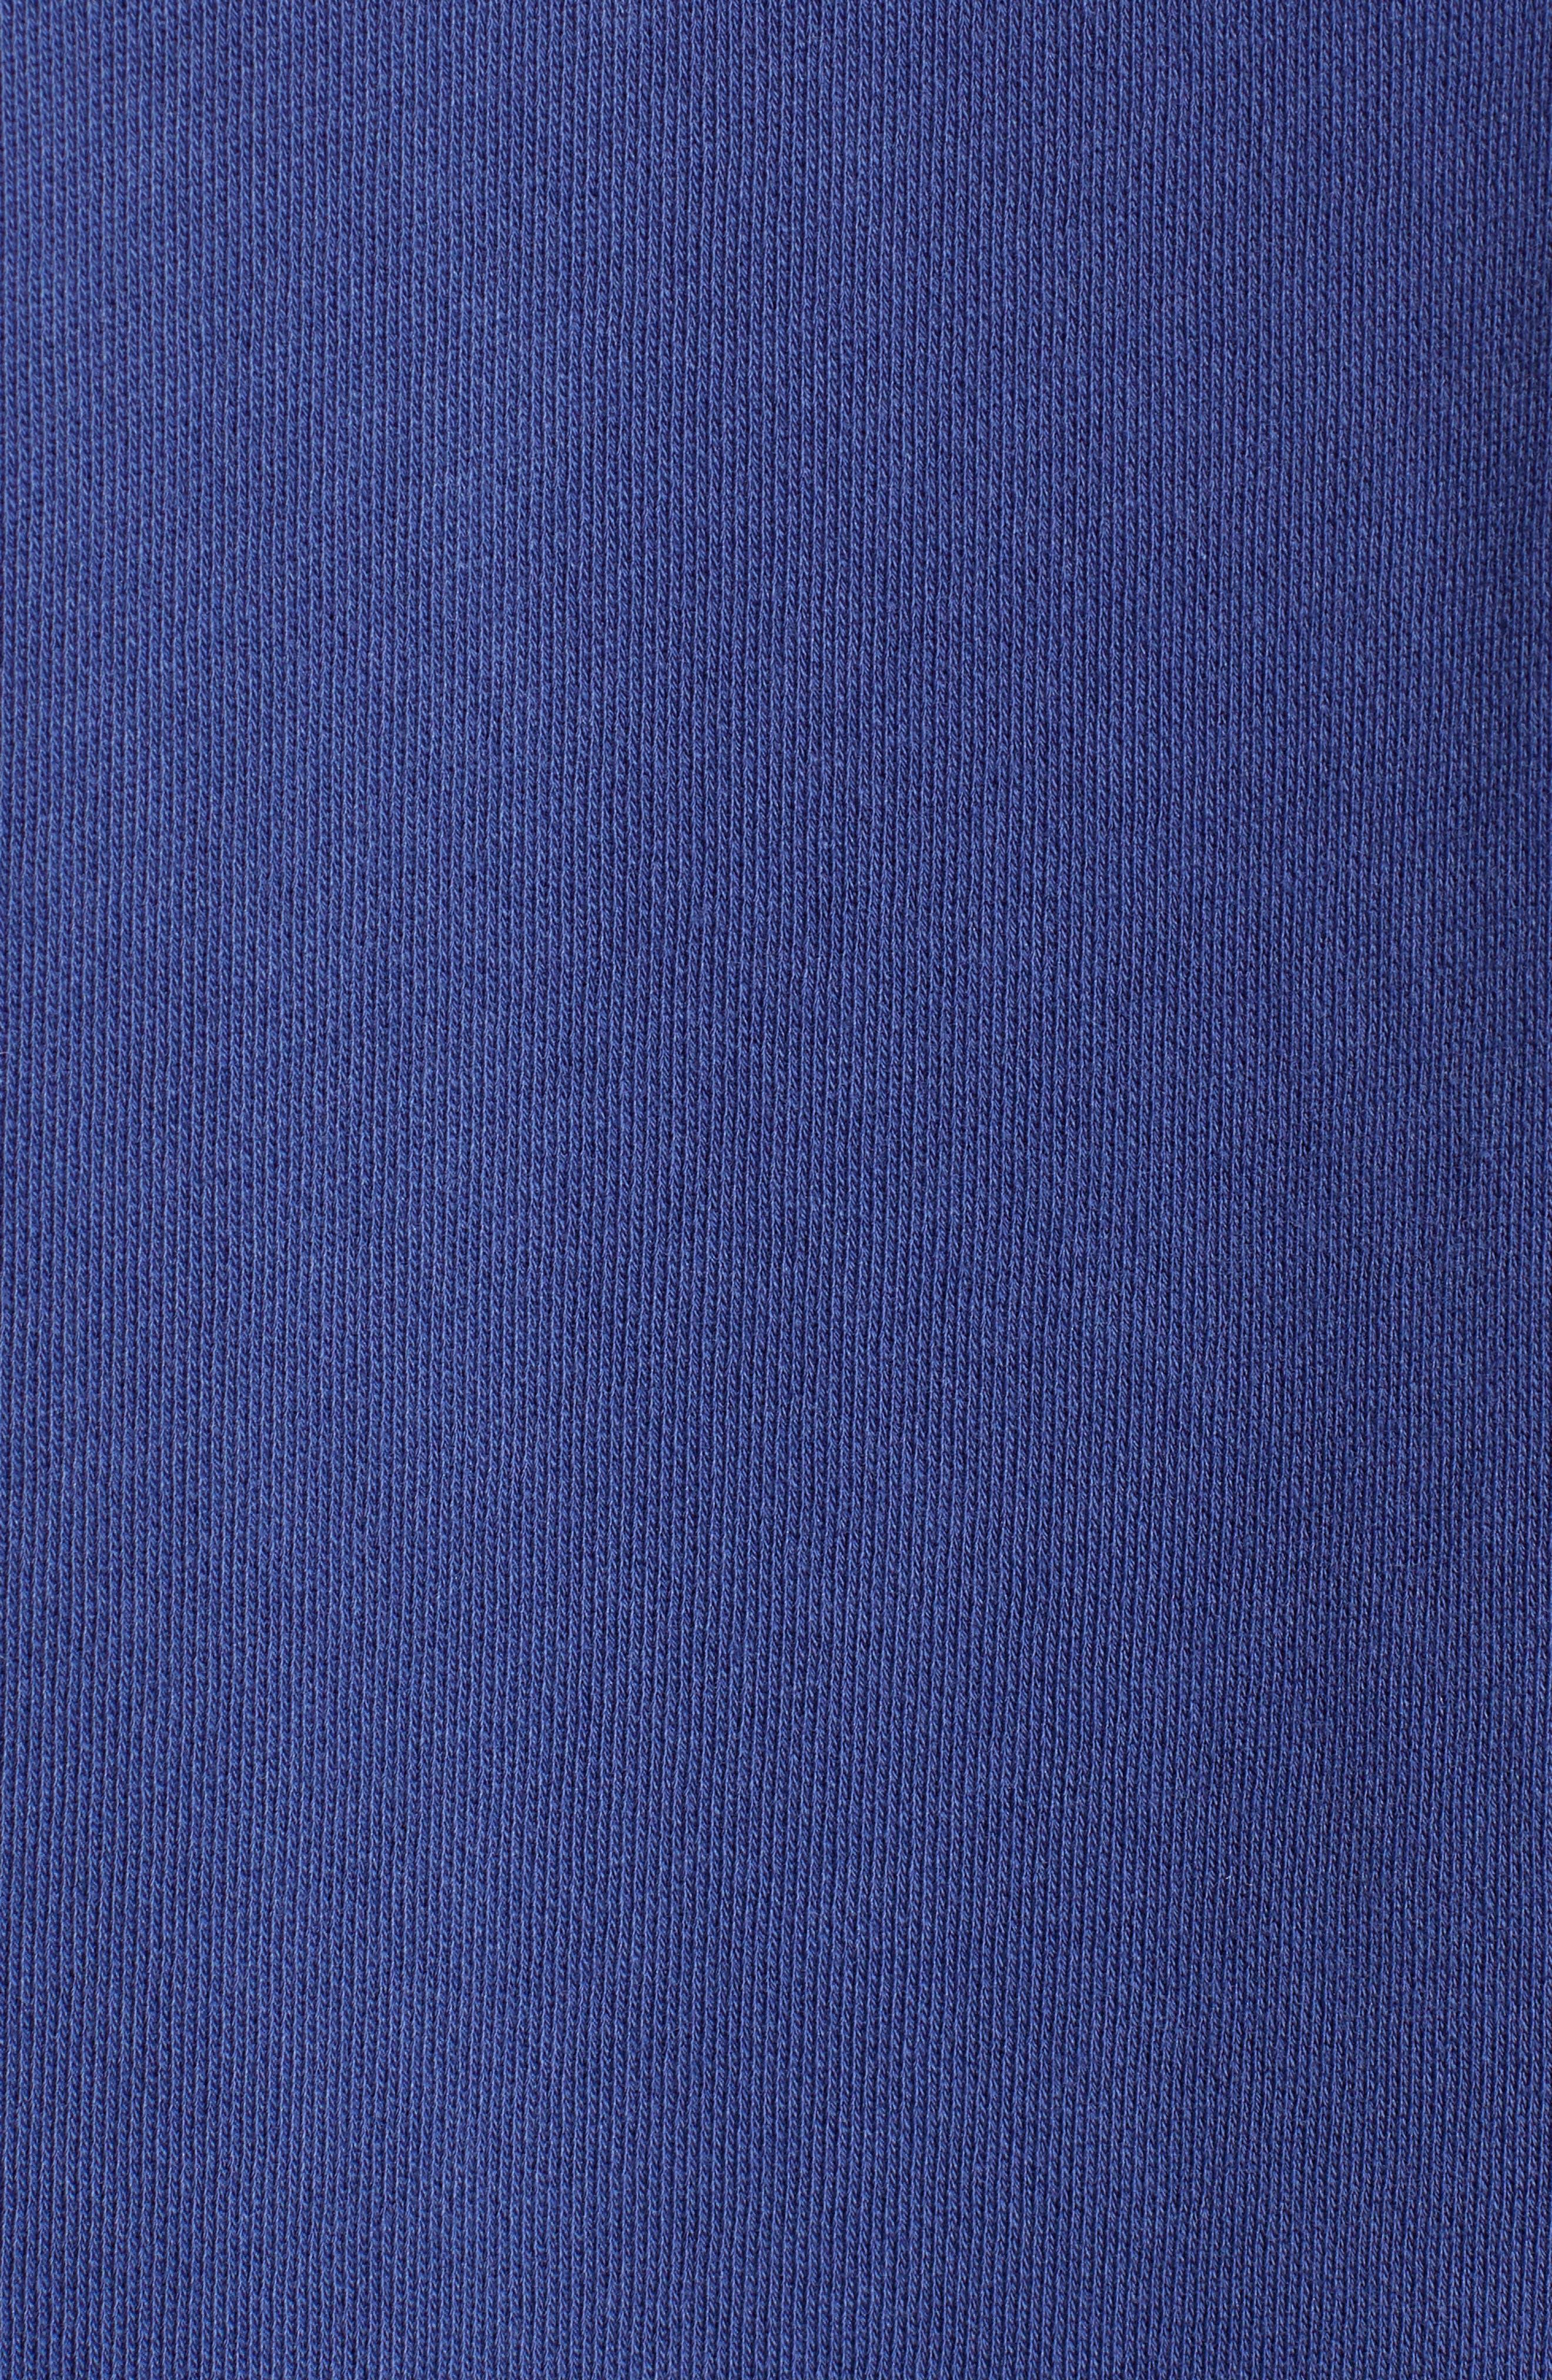 Dunham Crewneck Sweatshirt,                             Alternate thumbnail 5, color,                             BLUE PRINT